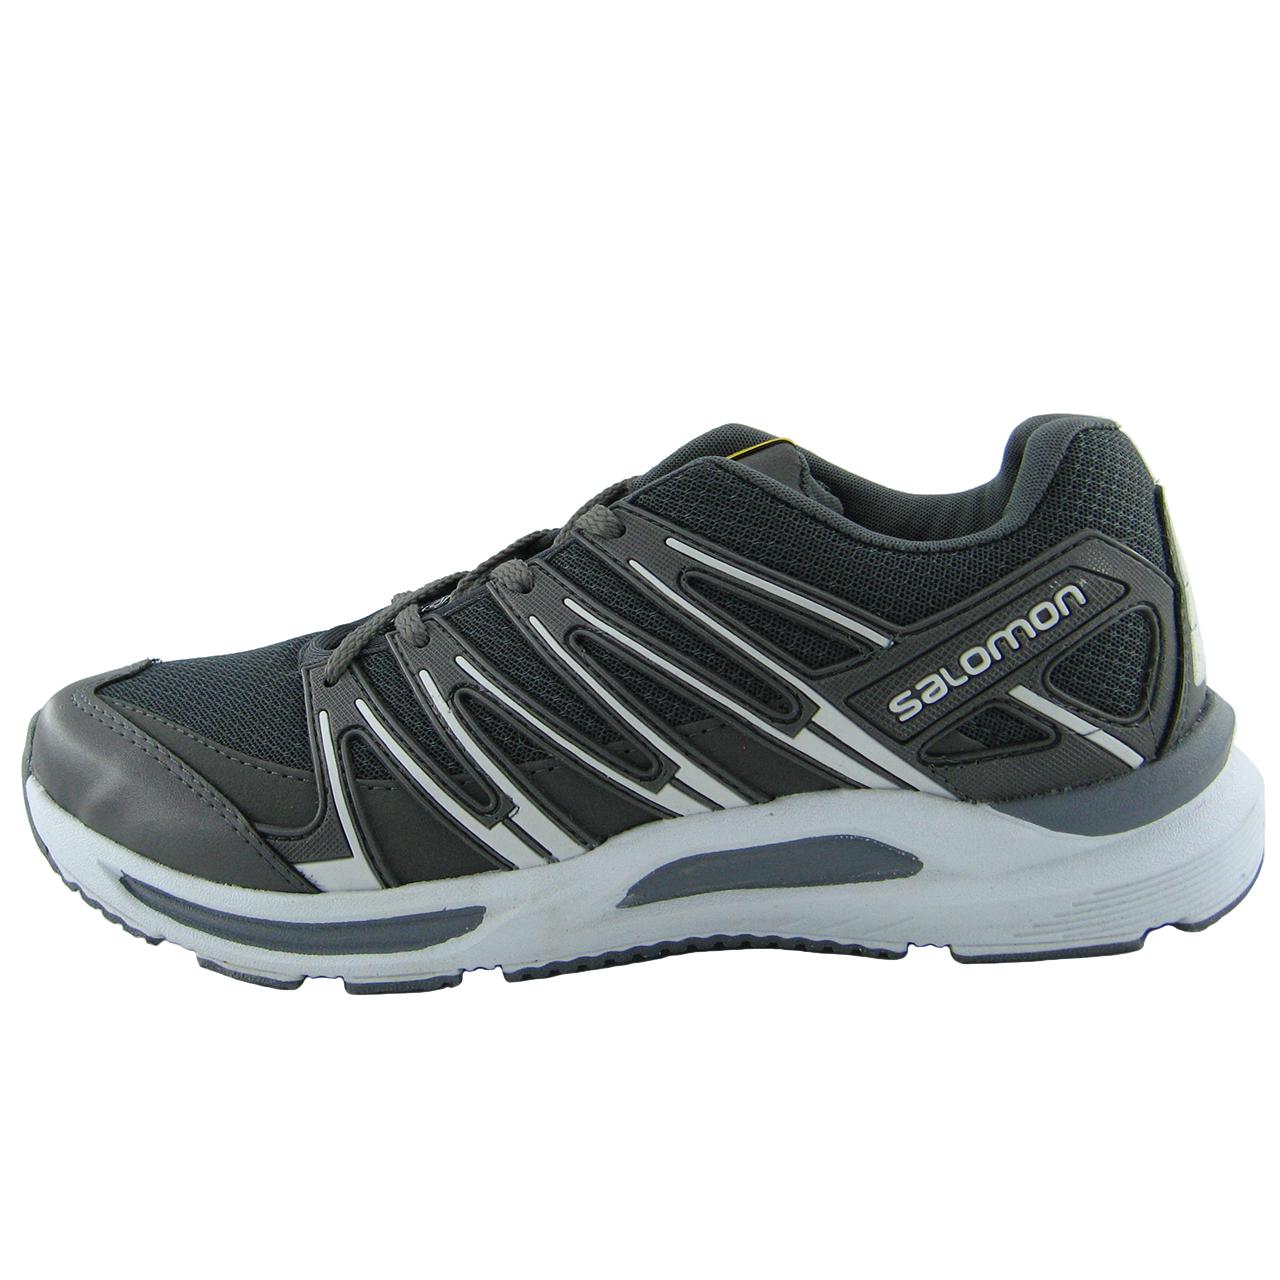 خرید اینترنتی                     کفش کوهنوردی مردانه کد sal-grey